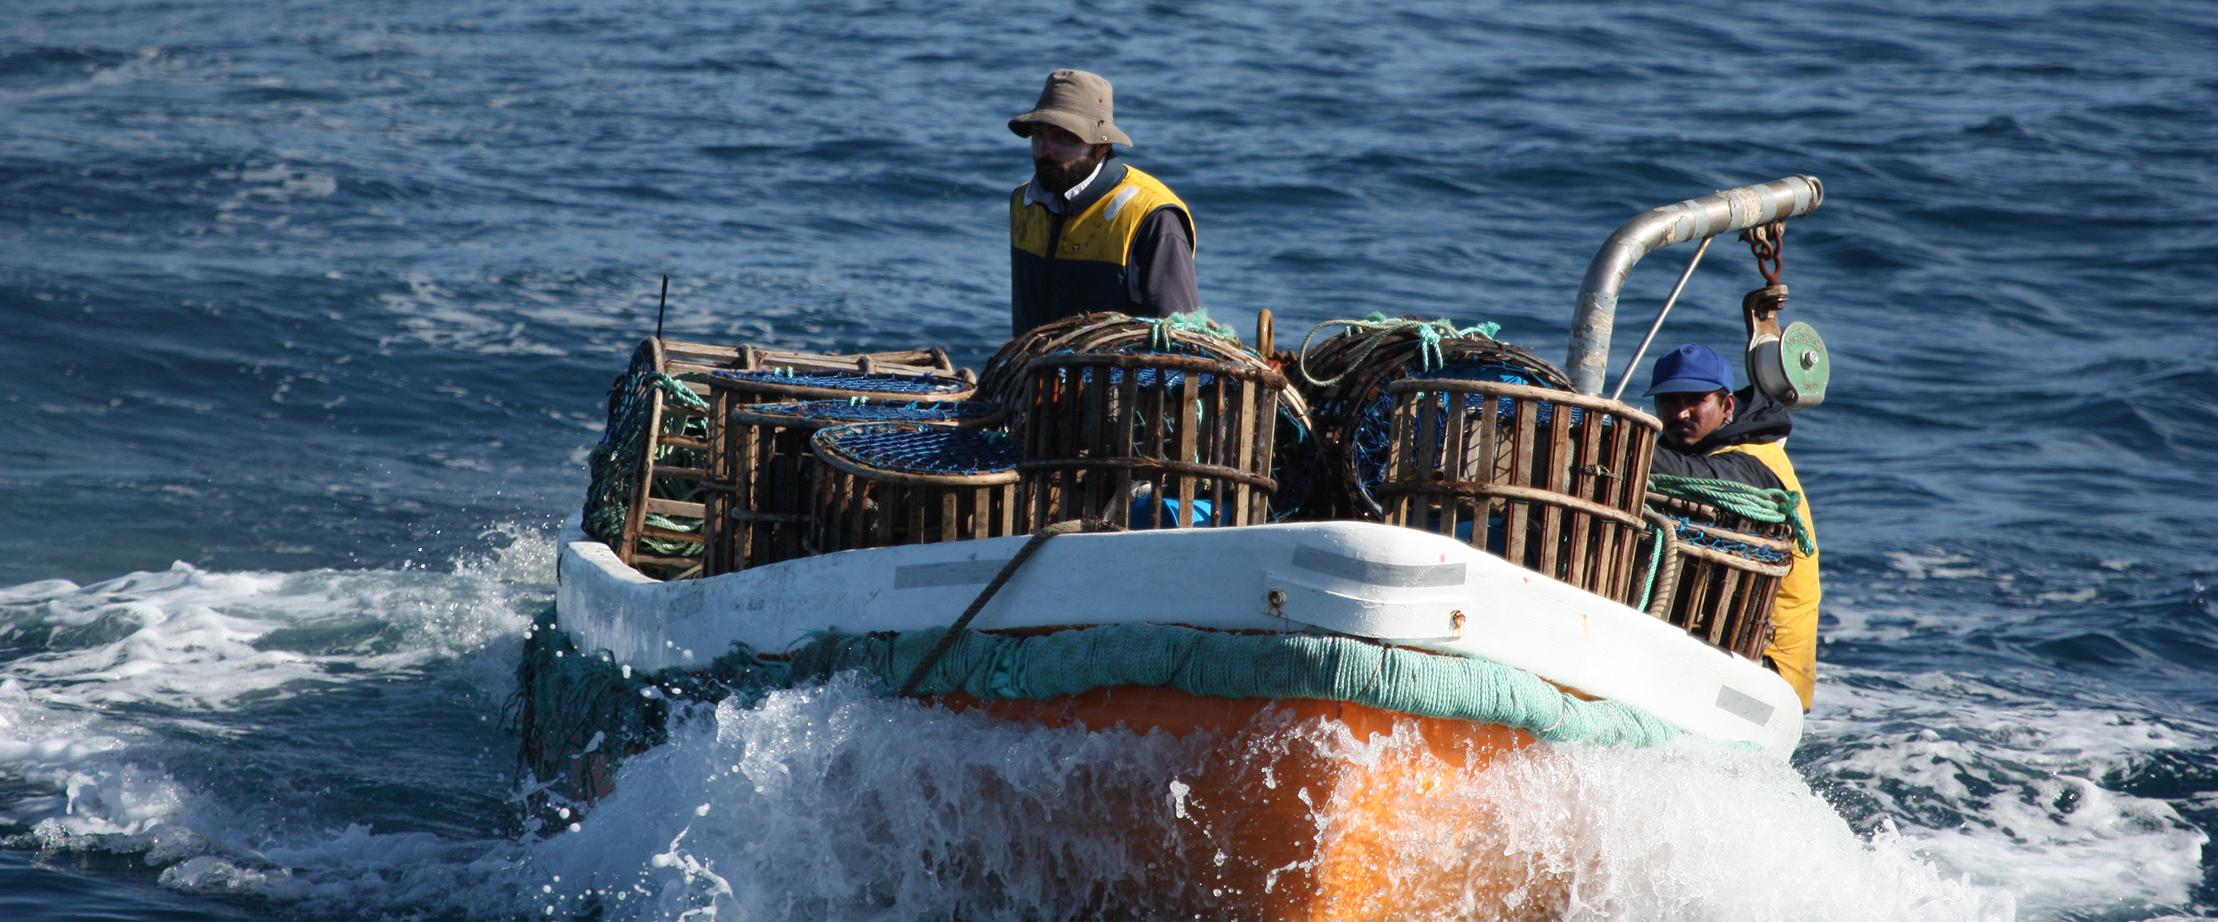 Sapmer rock lobster fishing